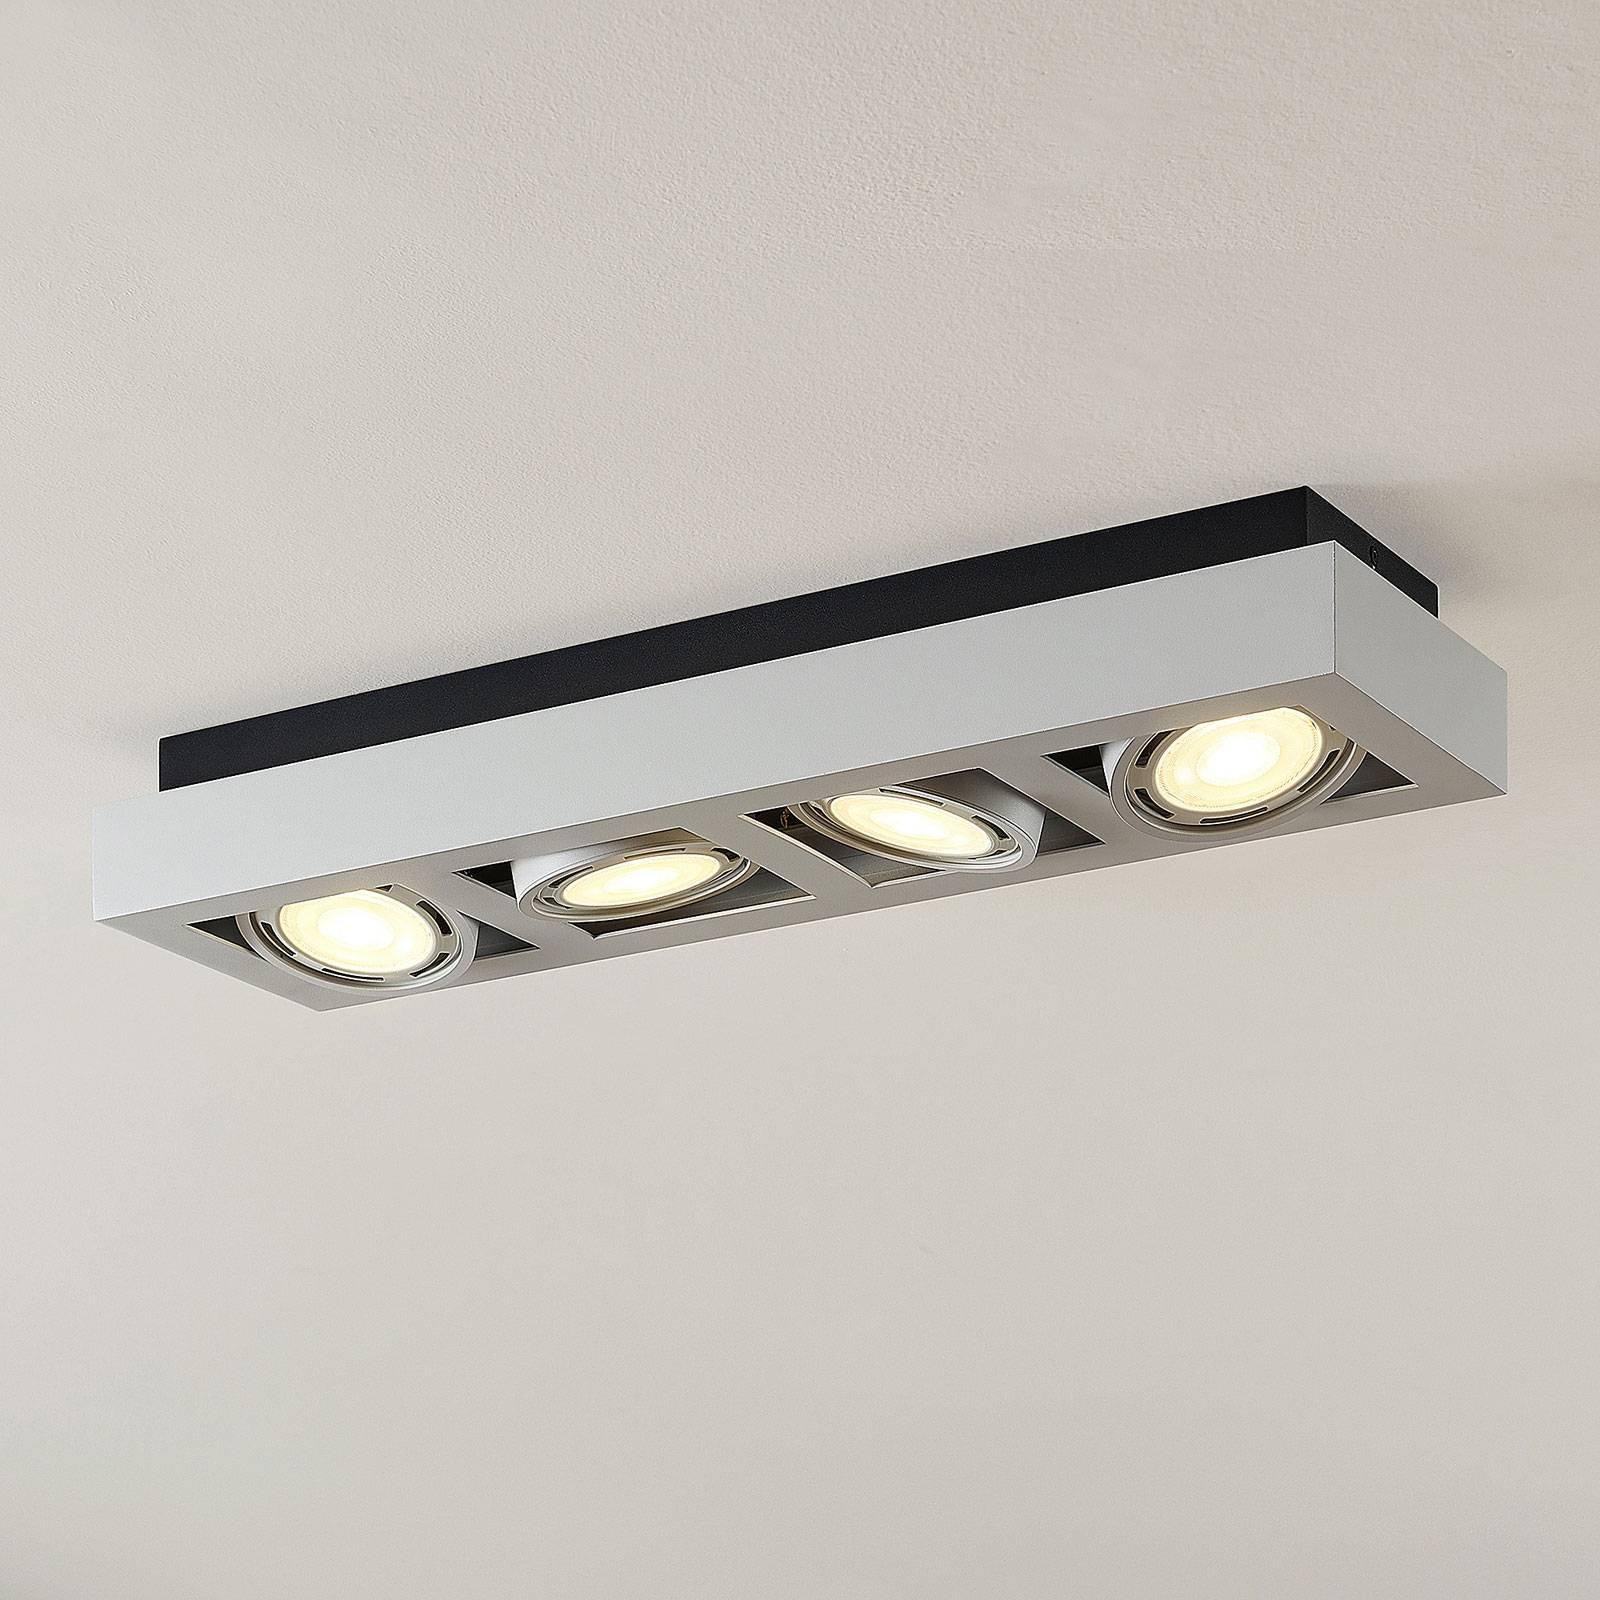 LED-takspot Ronka, 4 lyskilder, lang, hvit